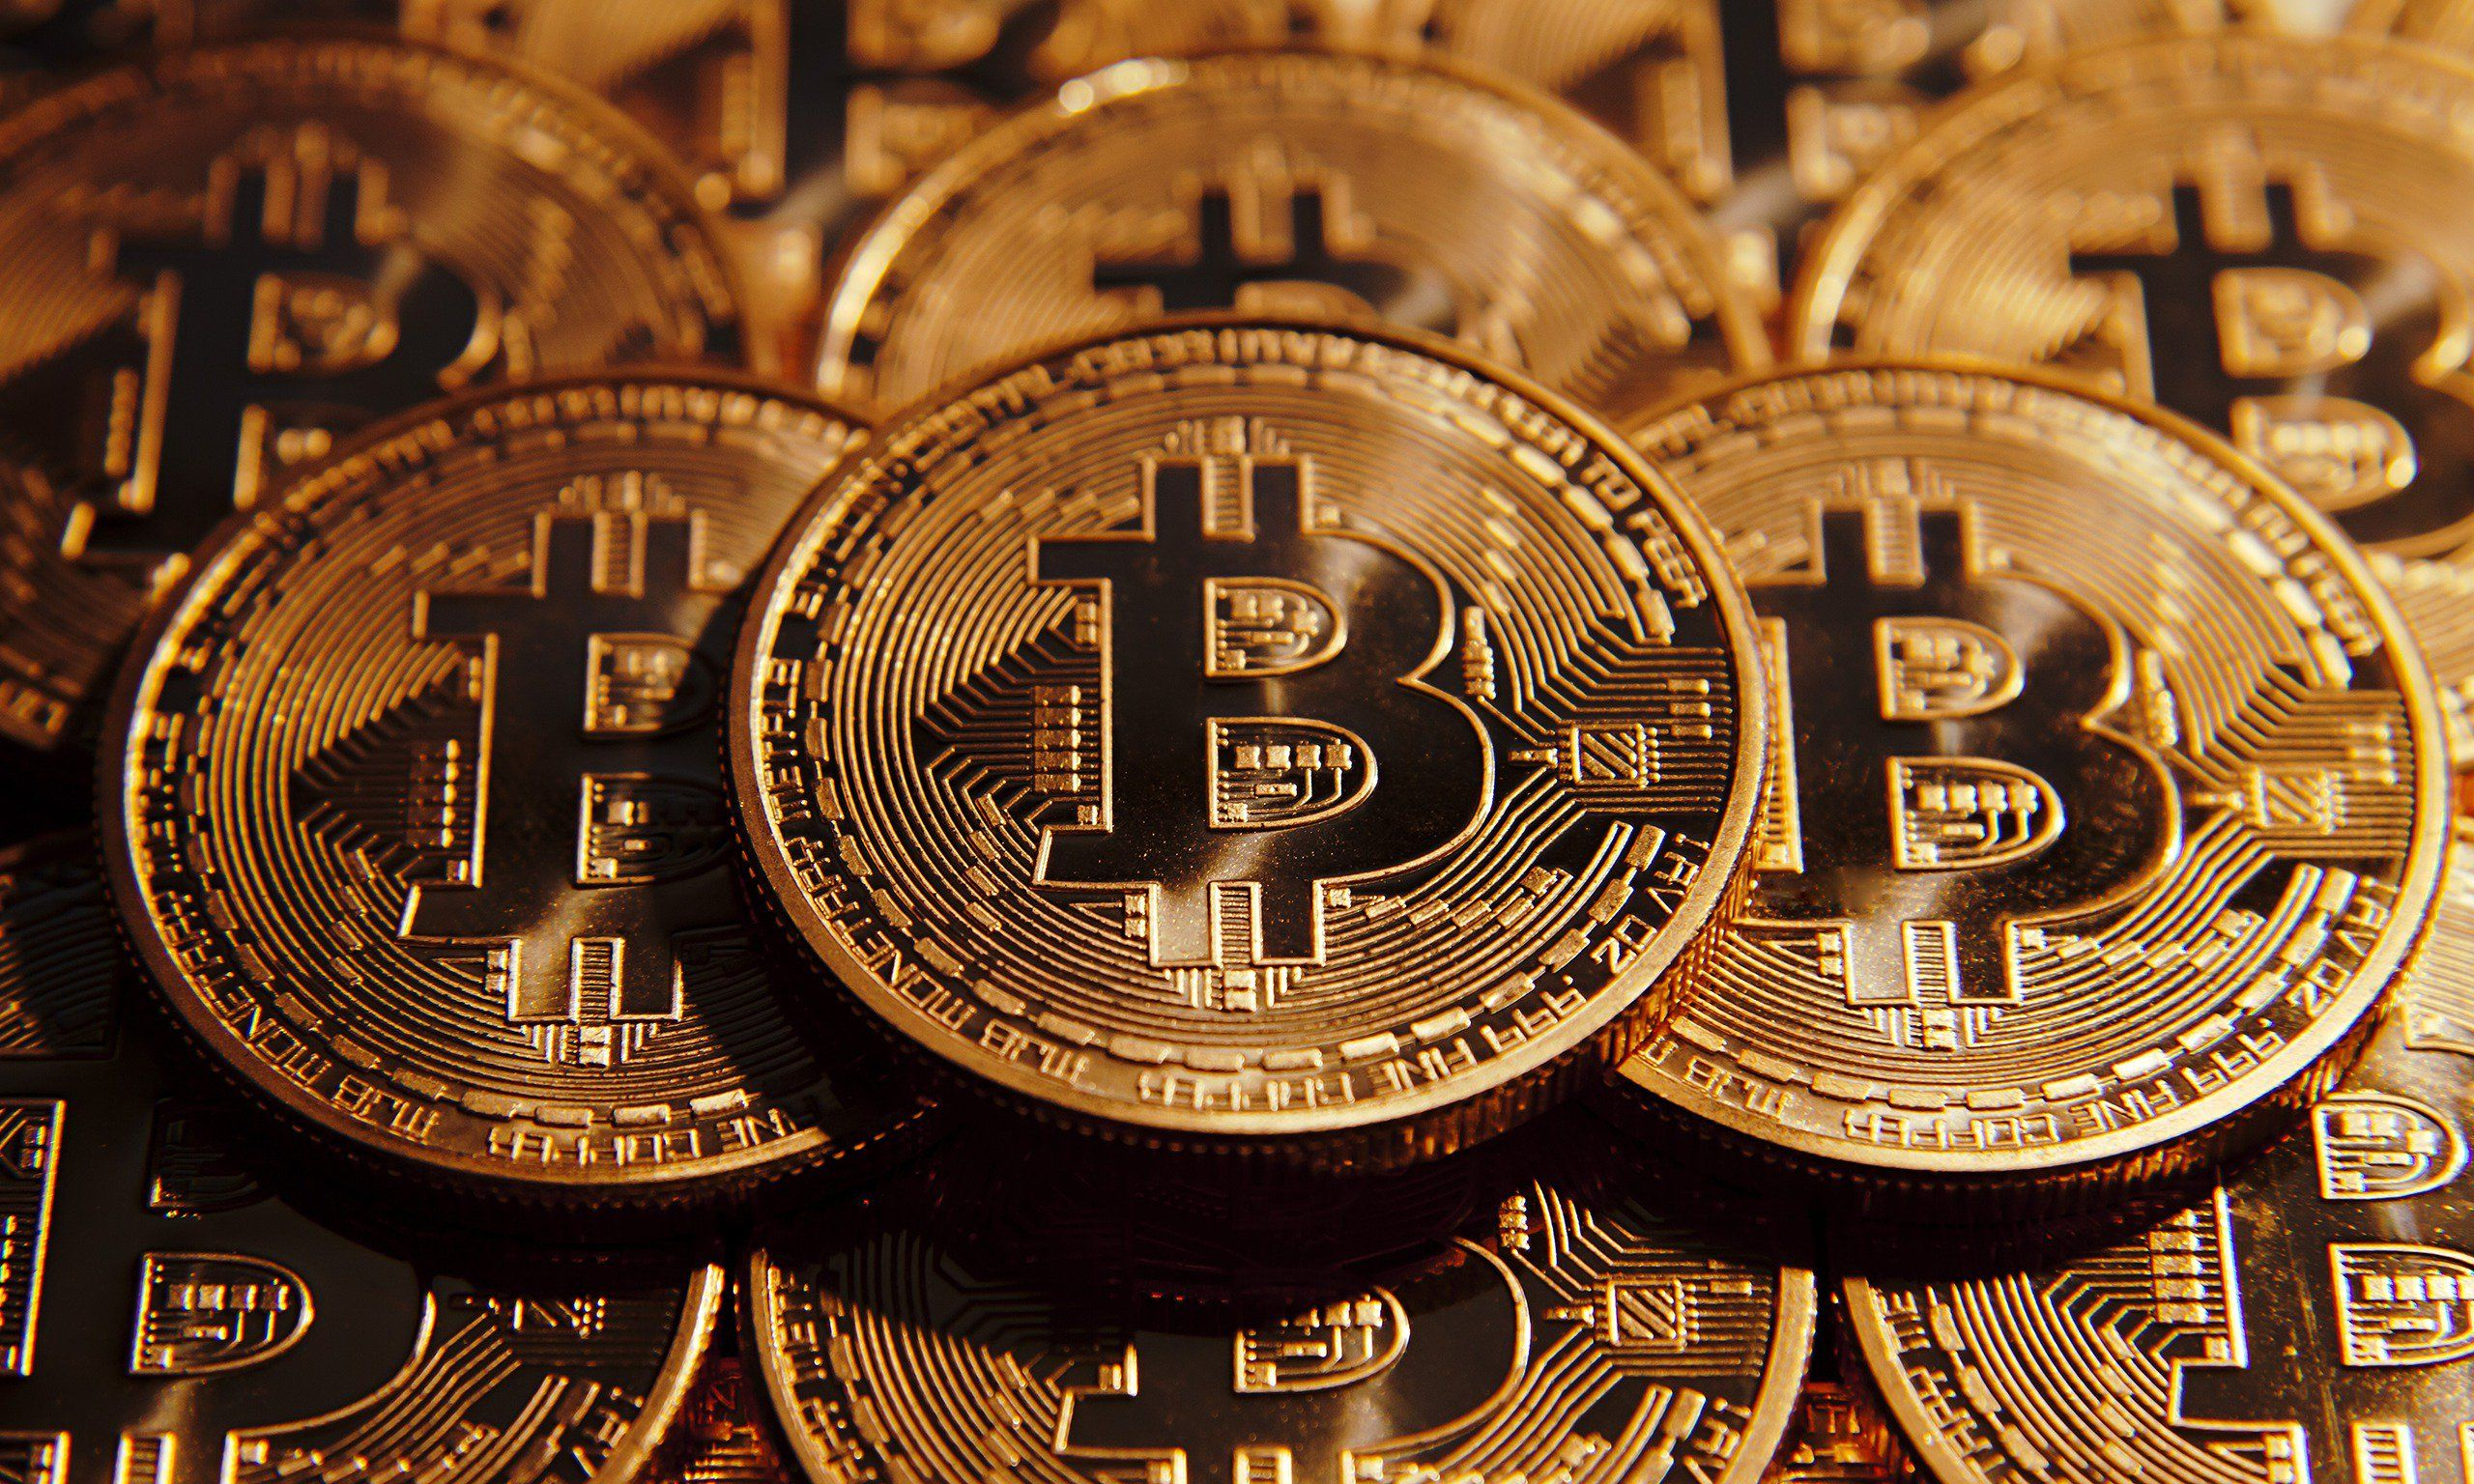 Bitcoin cash explorer testnet - Copay for Windows